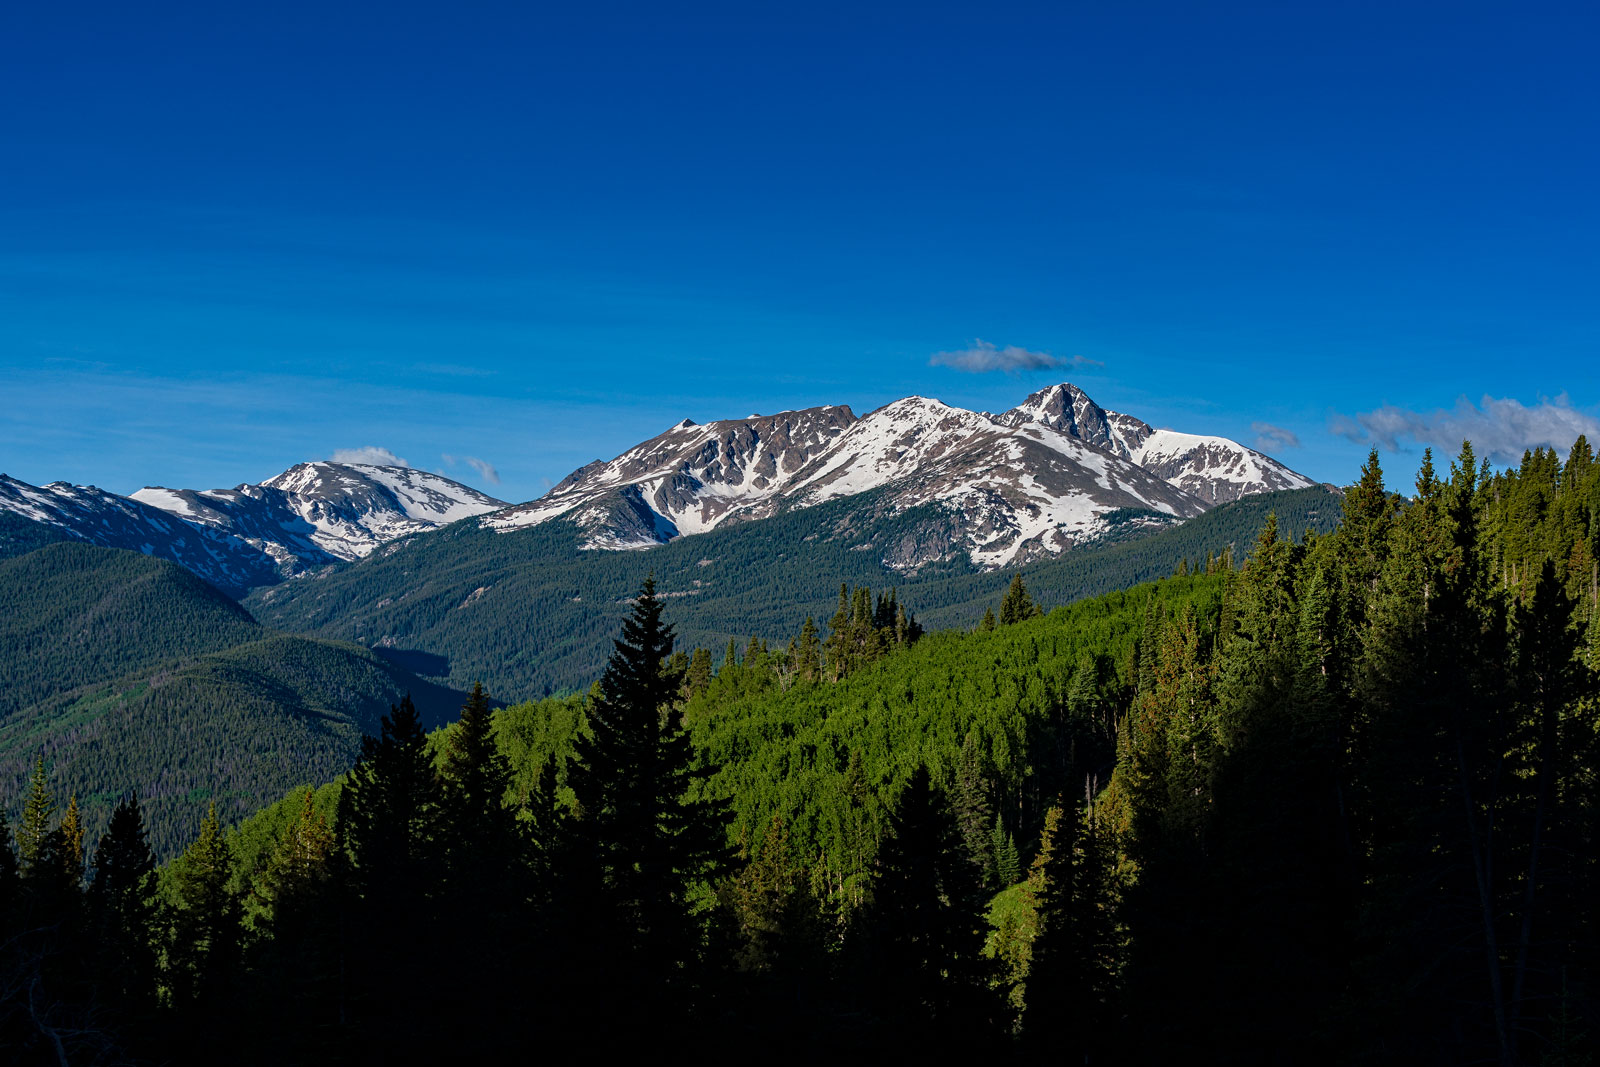 Battle_Mountain_Ranch_055.jpg